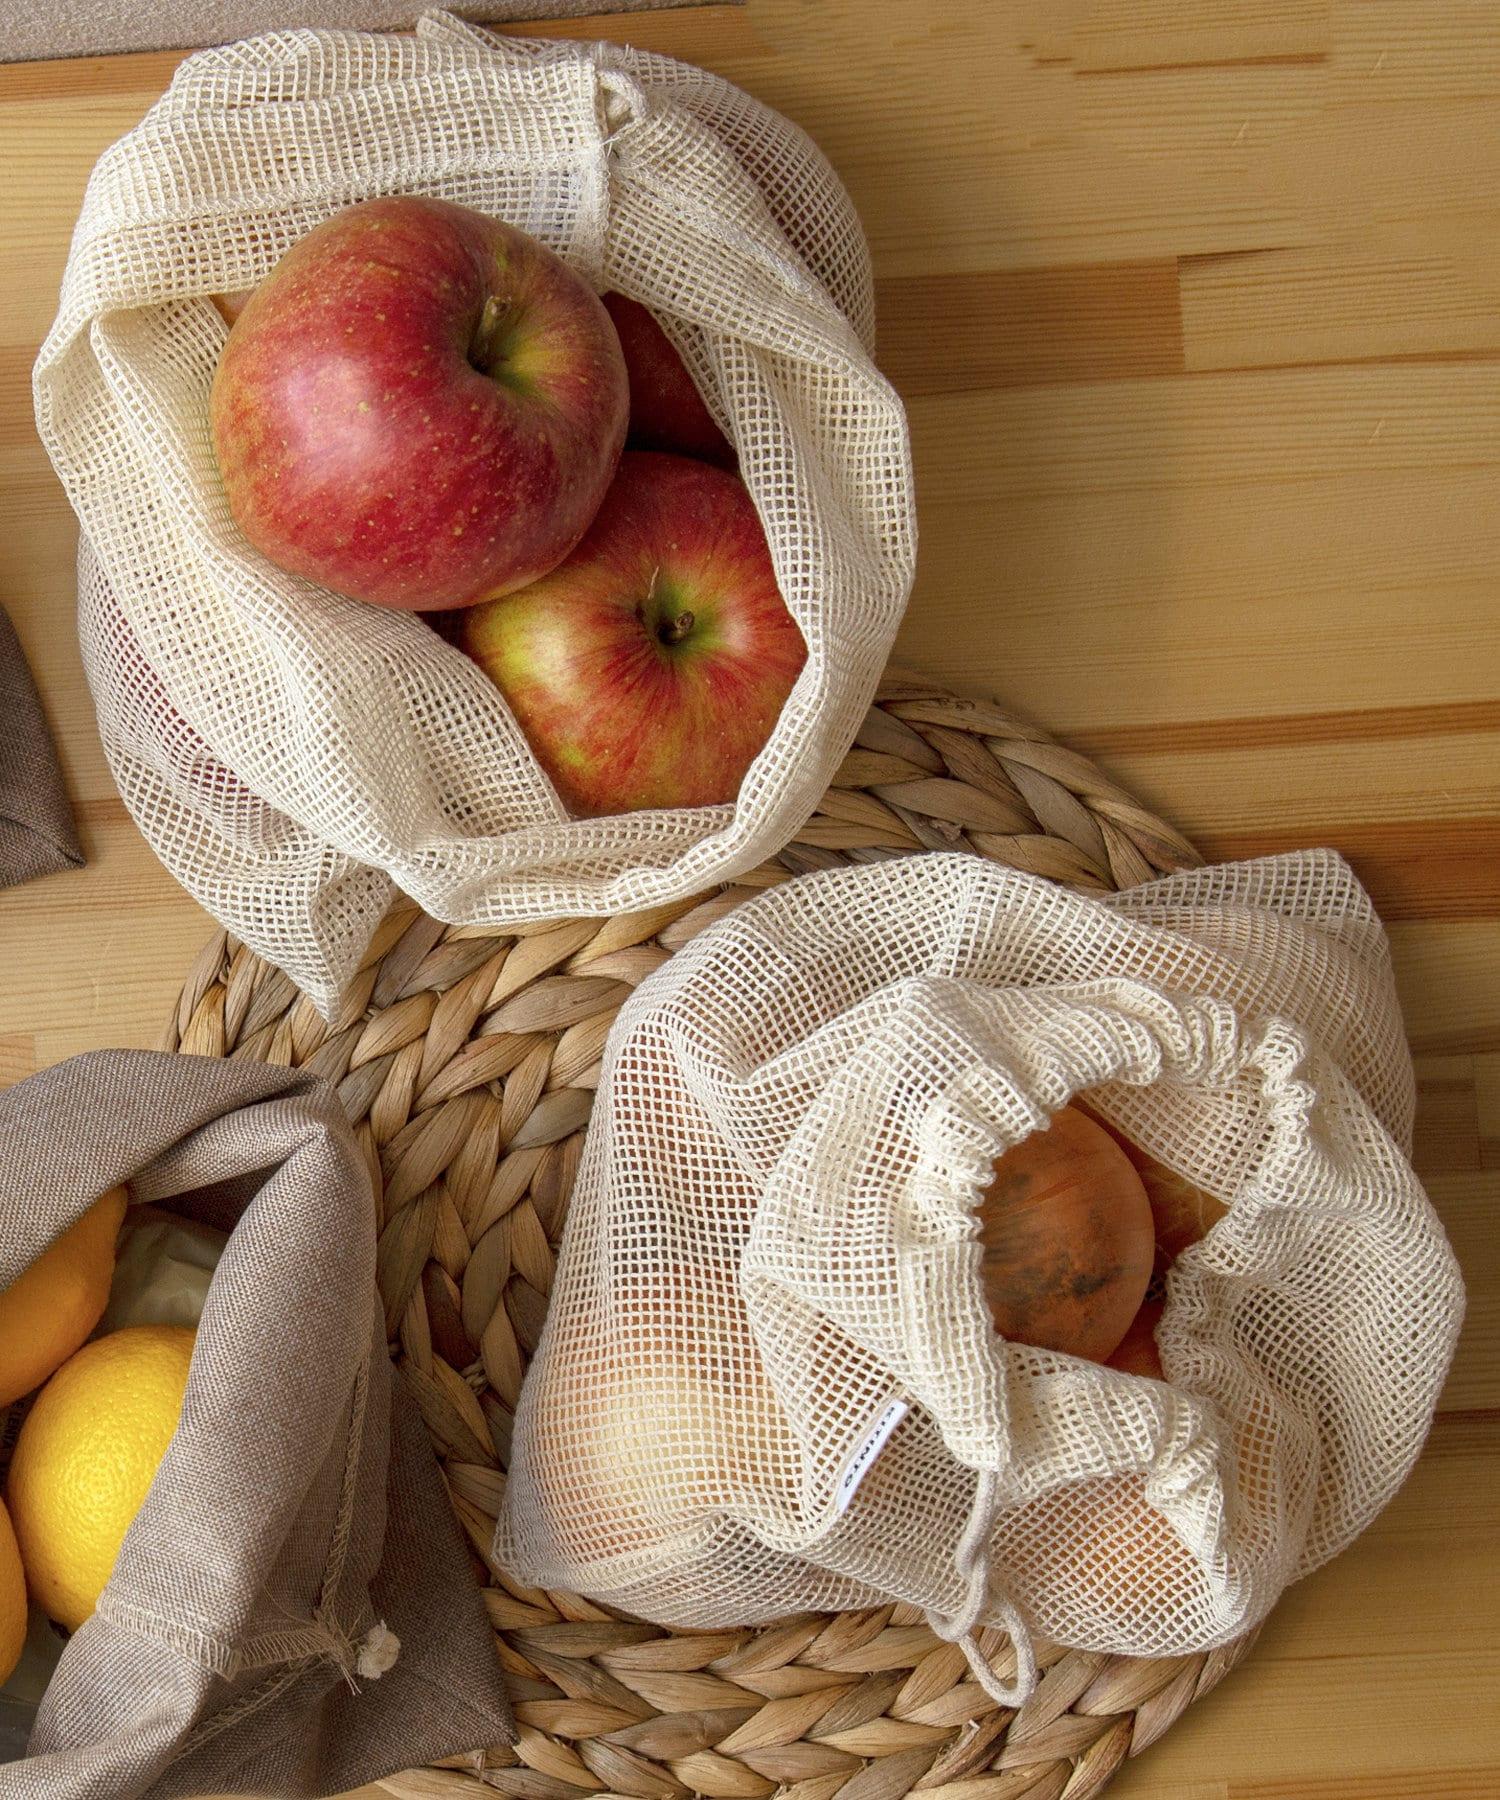 3COINS(スリーコインズ) ライフスタイル 【食材の保存や収納におすすめ】メッシュ巾着2枚セット ベージュ